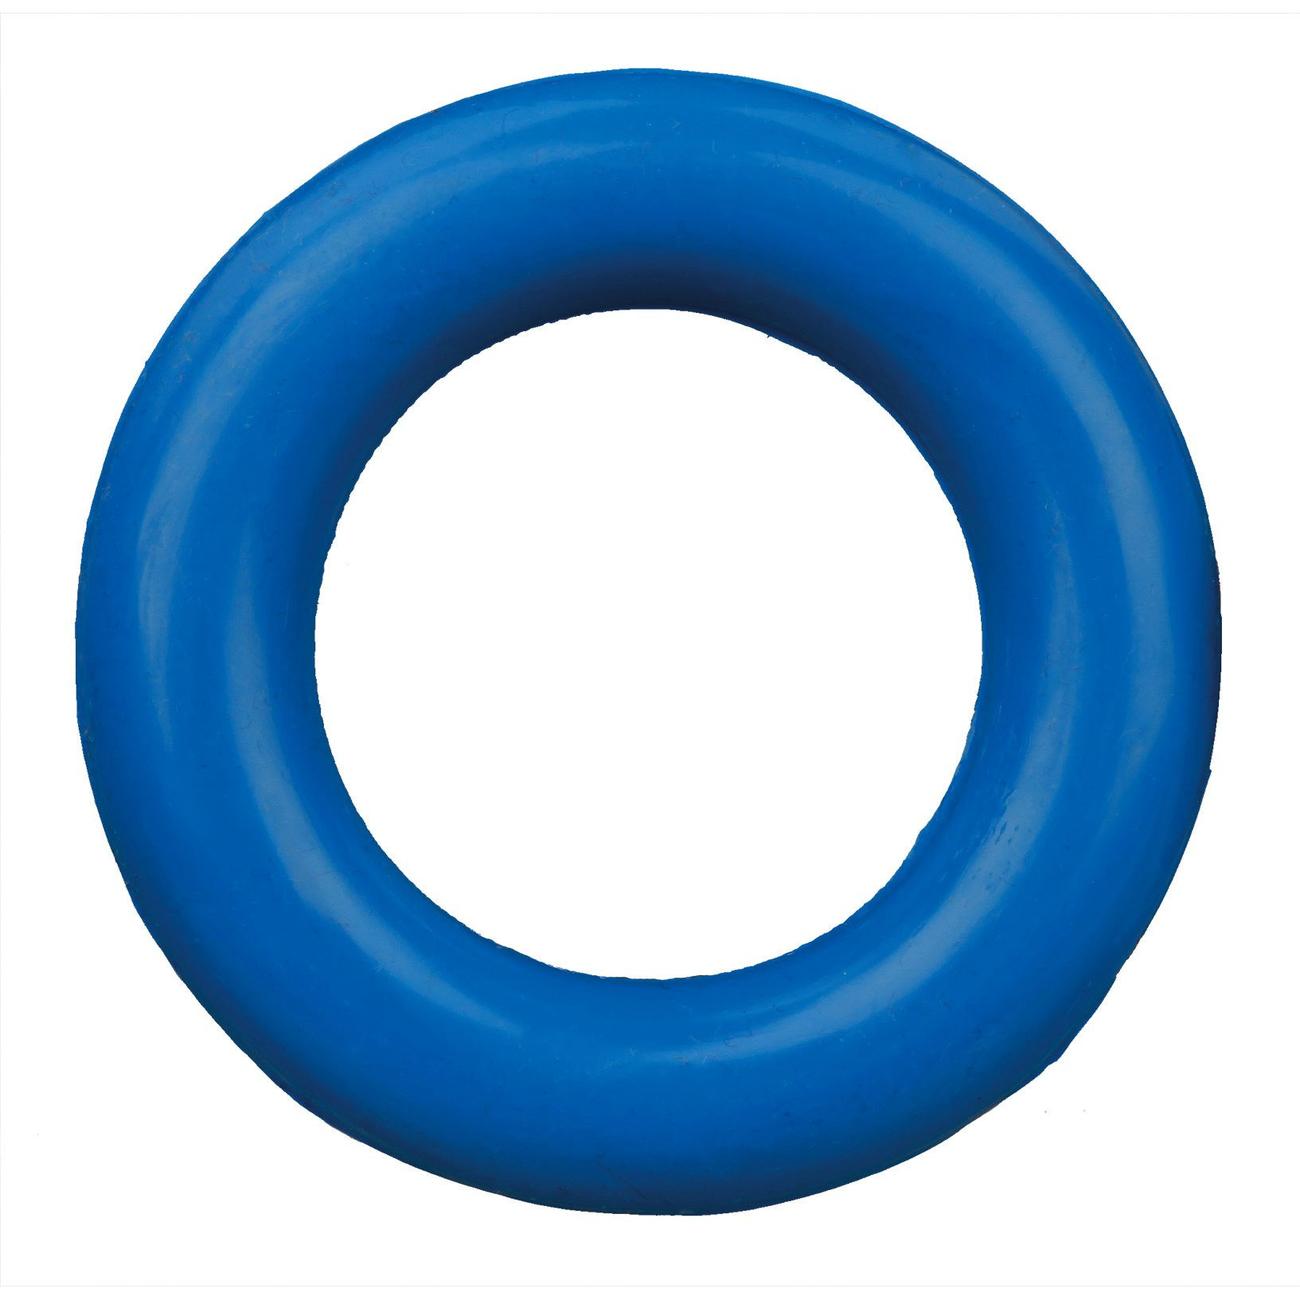 TRIXIE Hunde Ring Naturgummi Hundespielzeug Preview Image